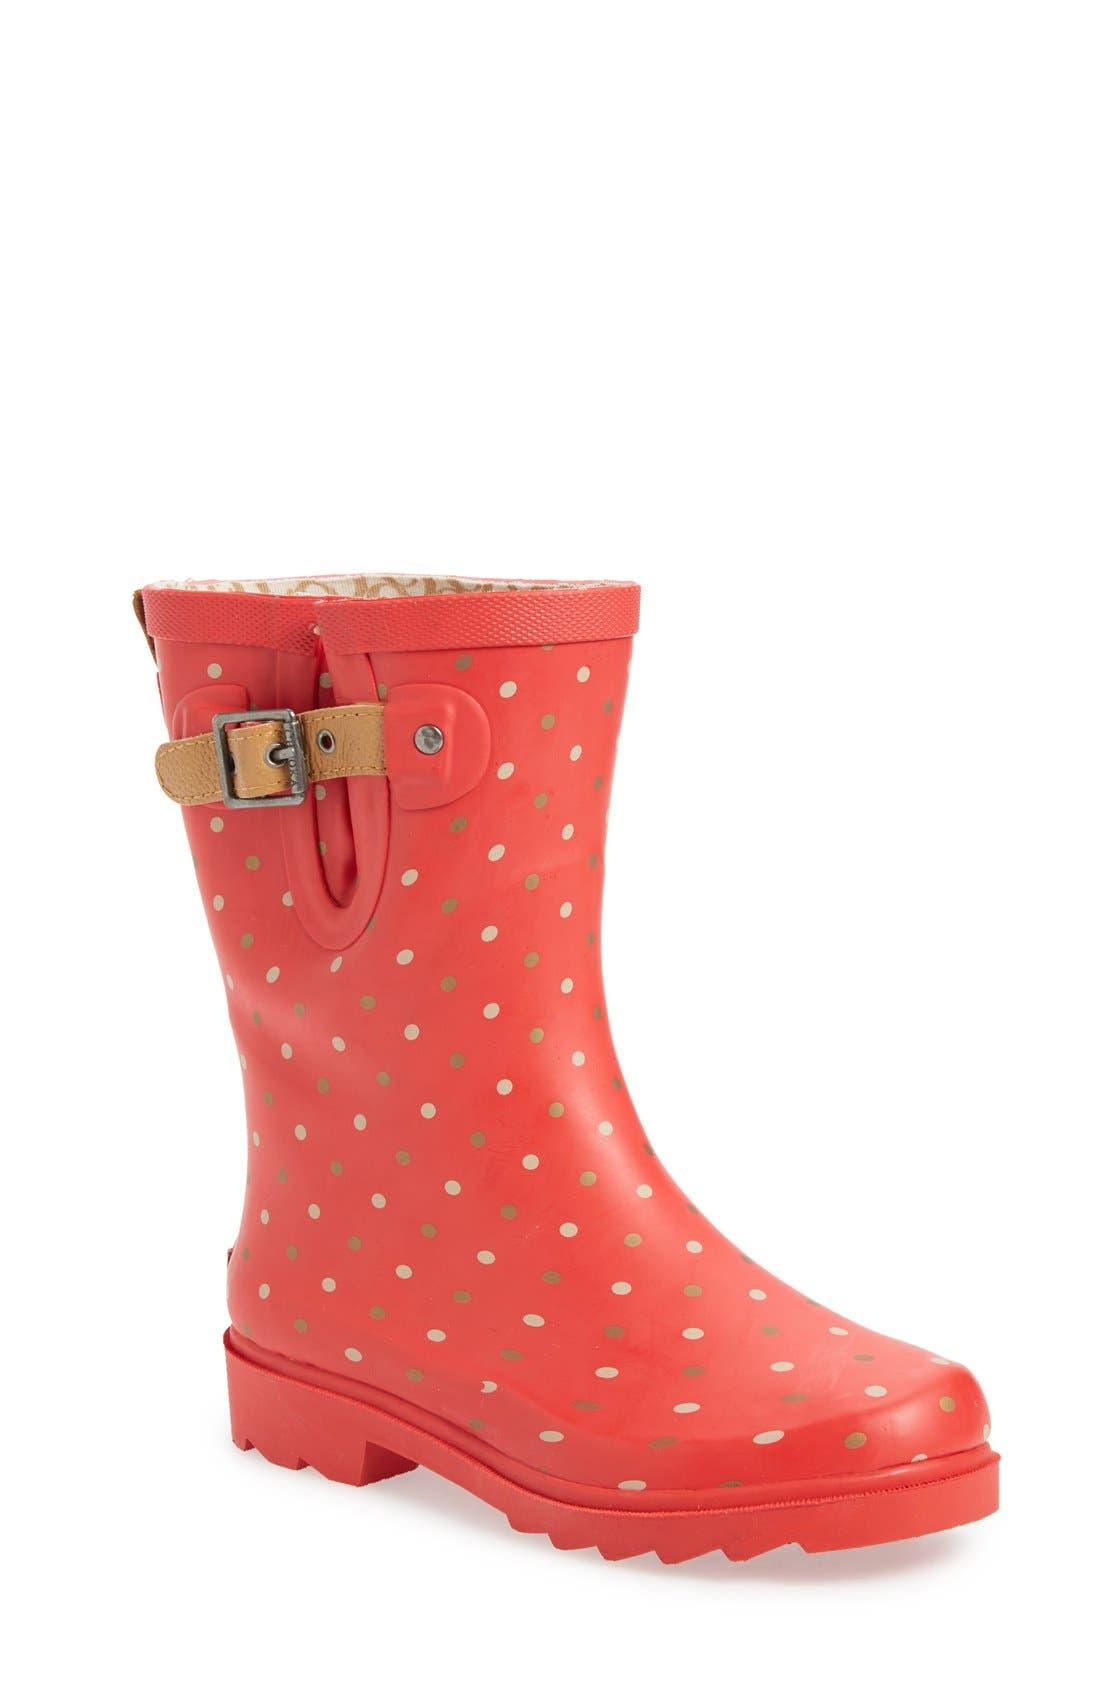 Alternate Image 1 Selected - Chooka 'Classic Dot' Mid High Rain Boot (Women)